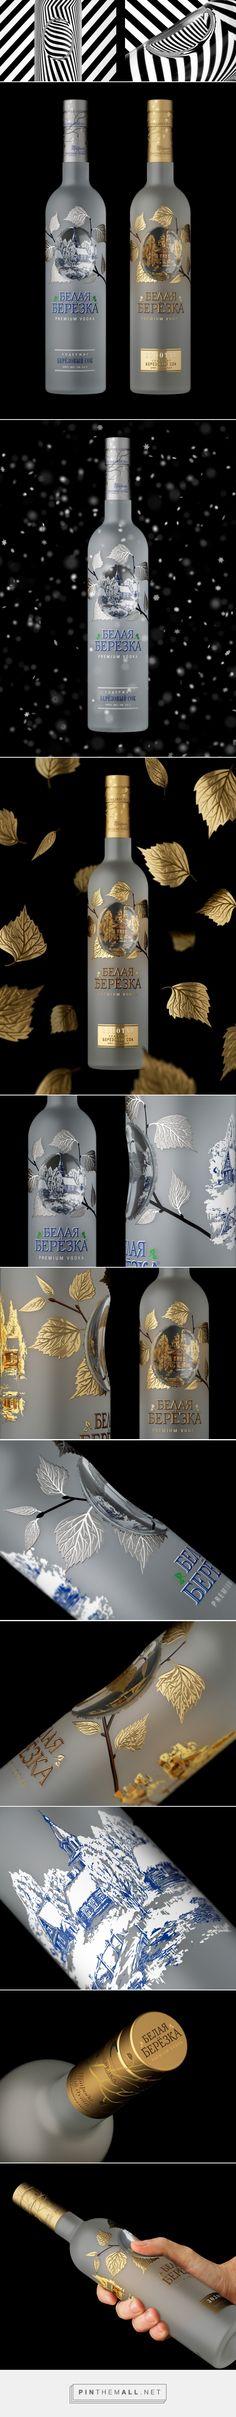 WHITE BIRCH Vodka packaging design by Yevgeny Razumov - http://www.packagingoftheworld.com/2016/10/white-birch-vodka-redesigned.html